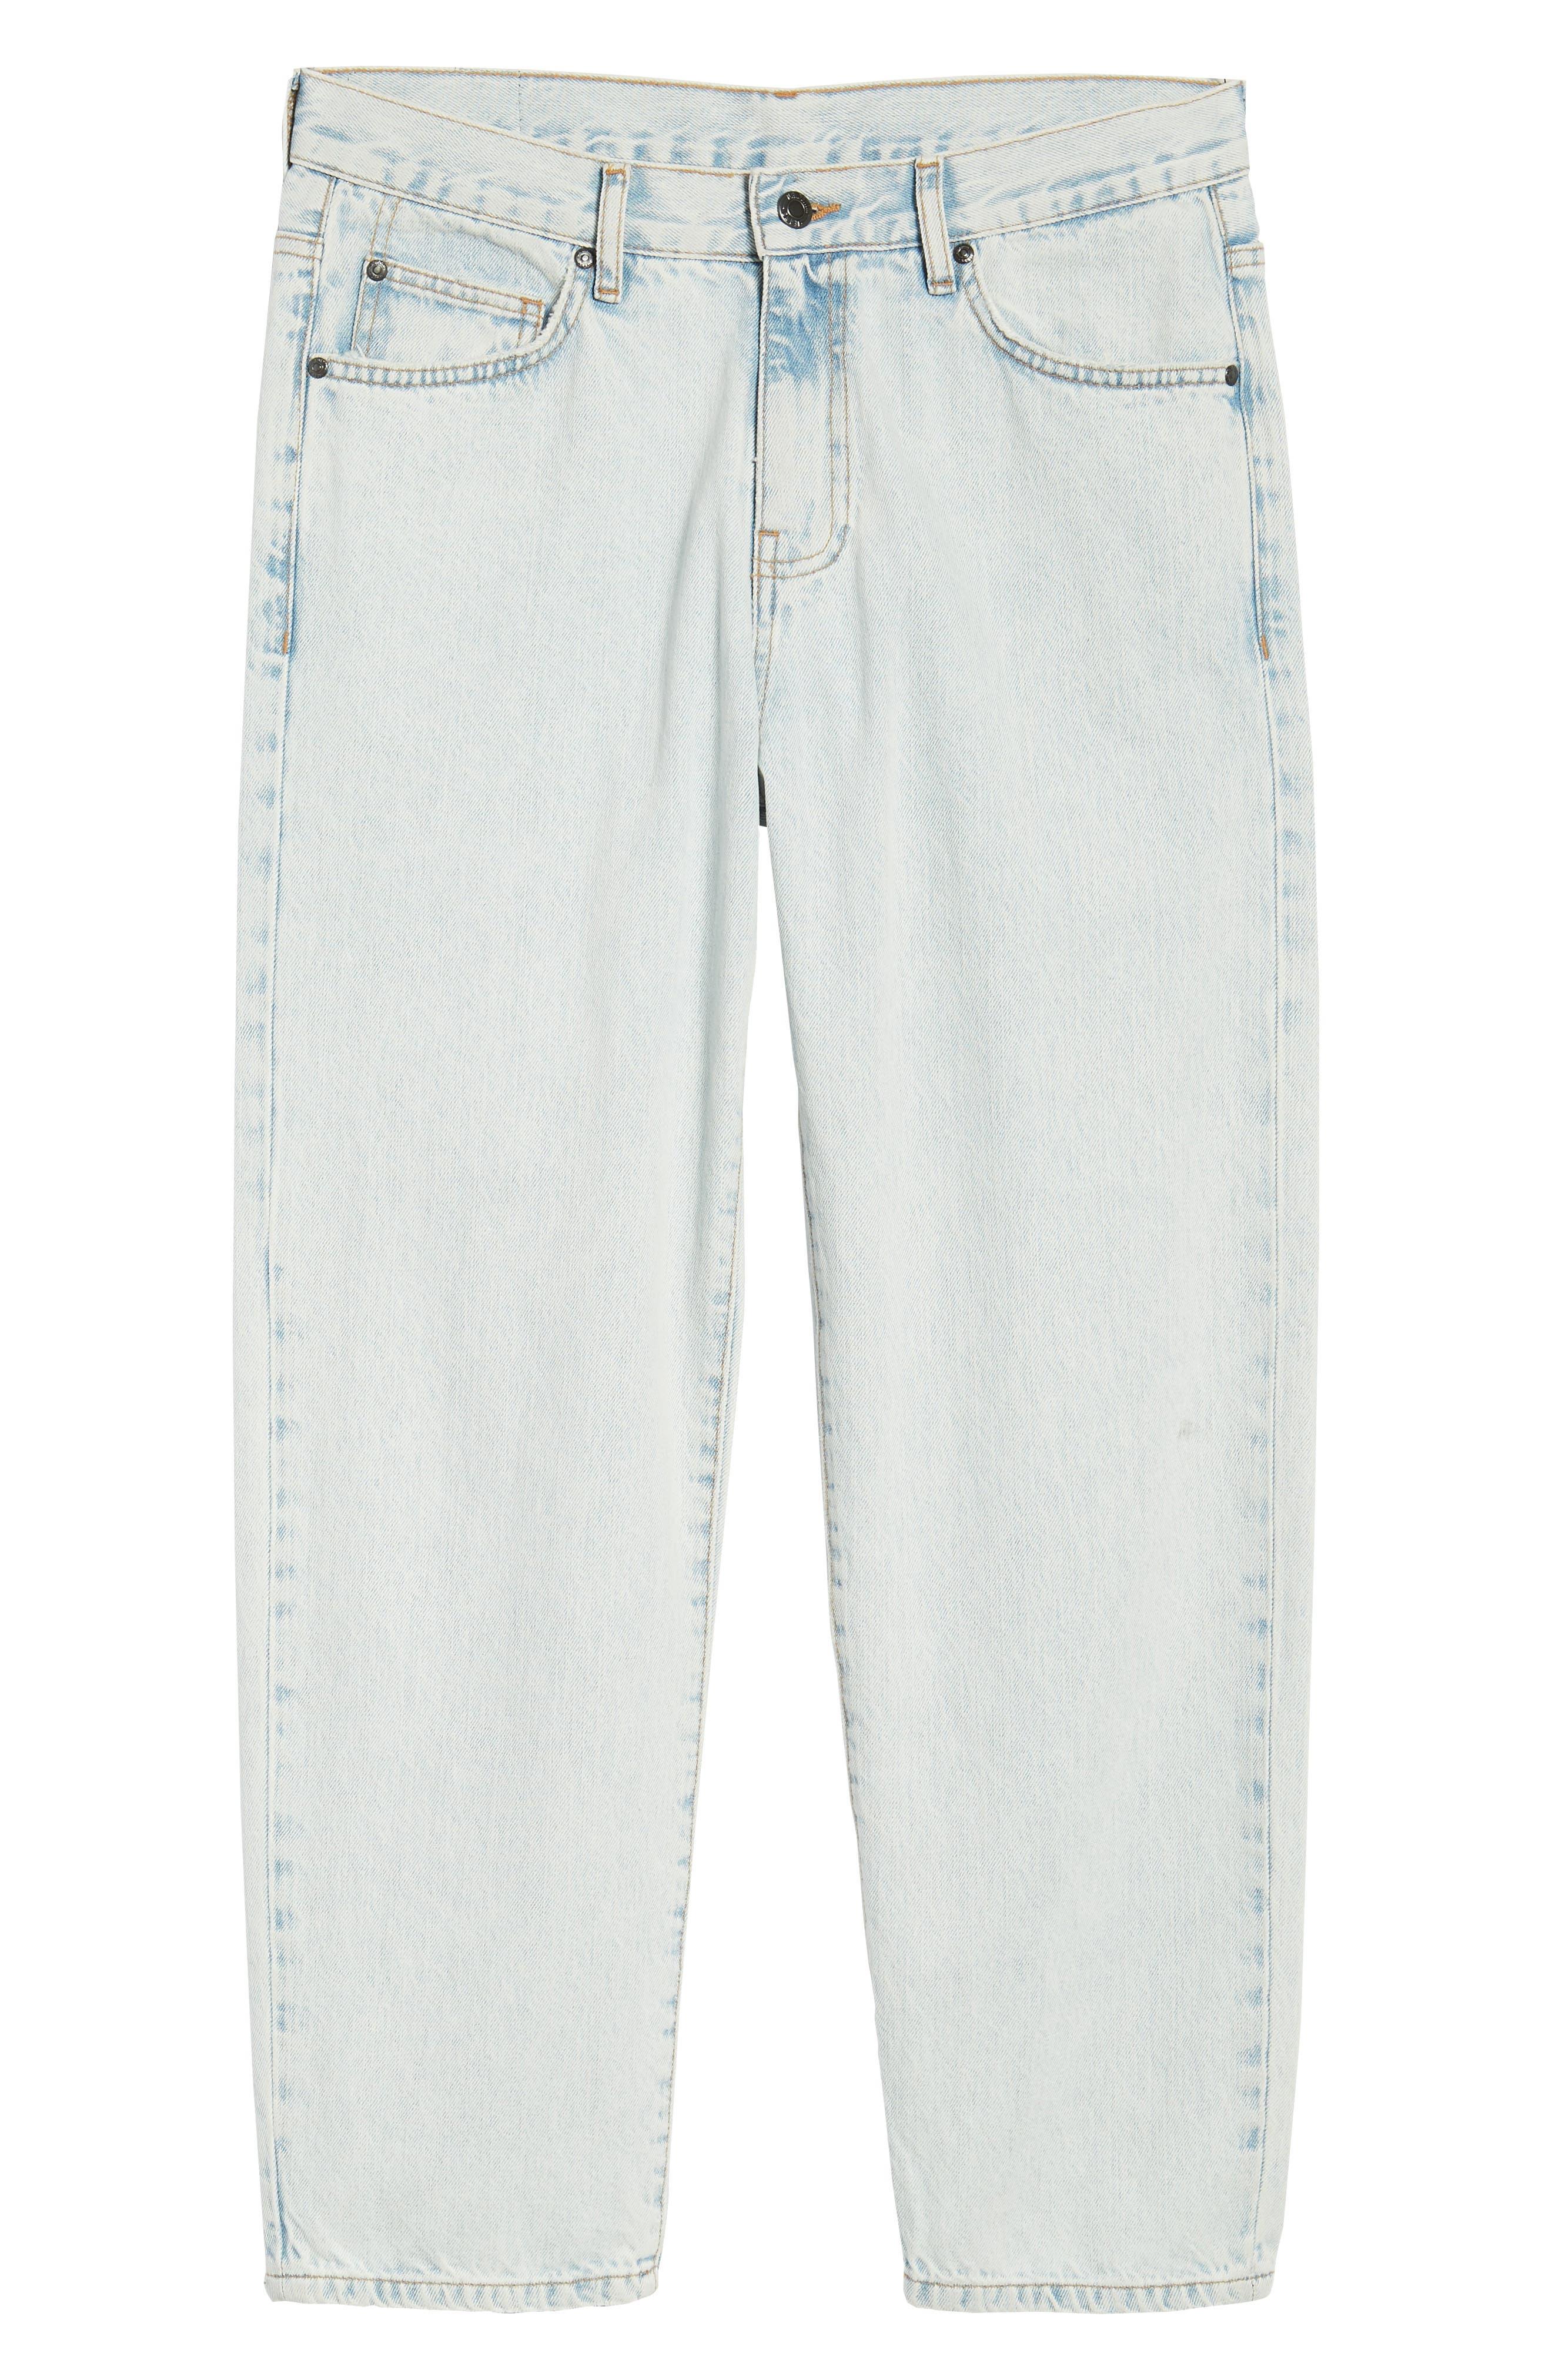 Otis Straight Fit Jeans,                             Alternate thumbnail 6, color,                             401